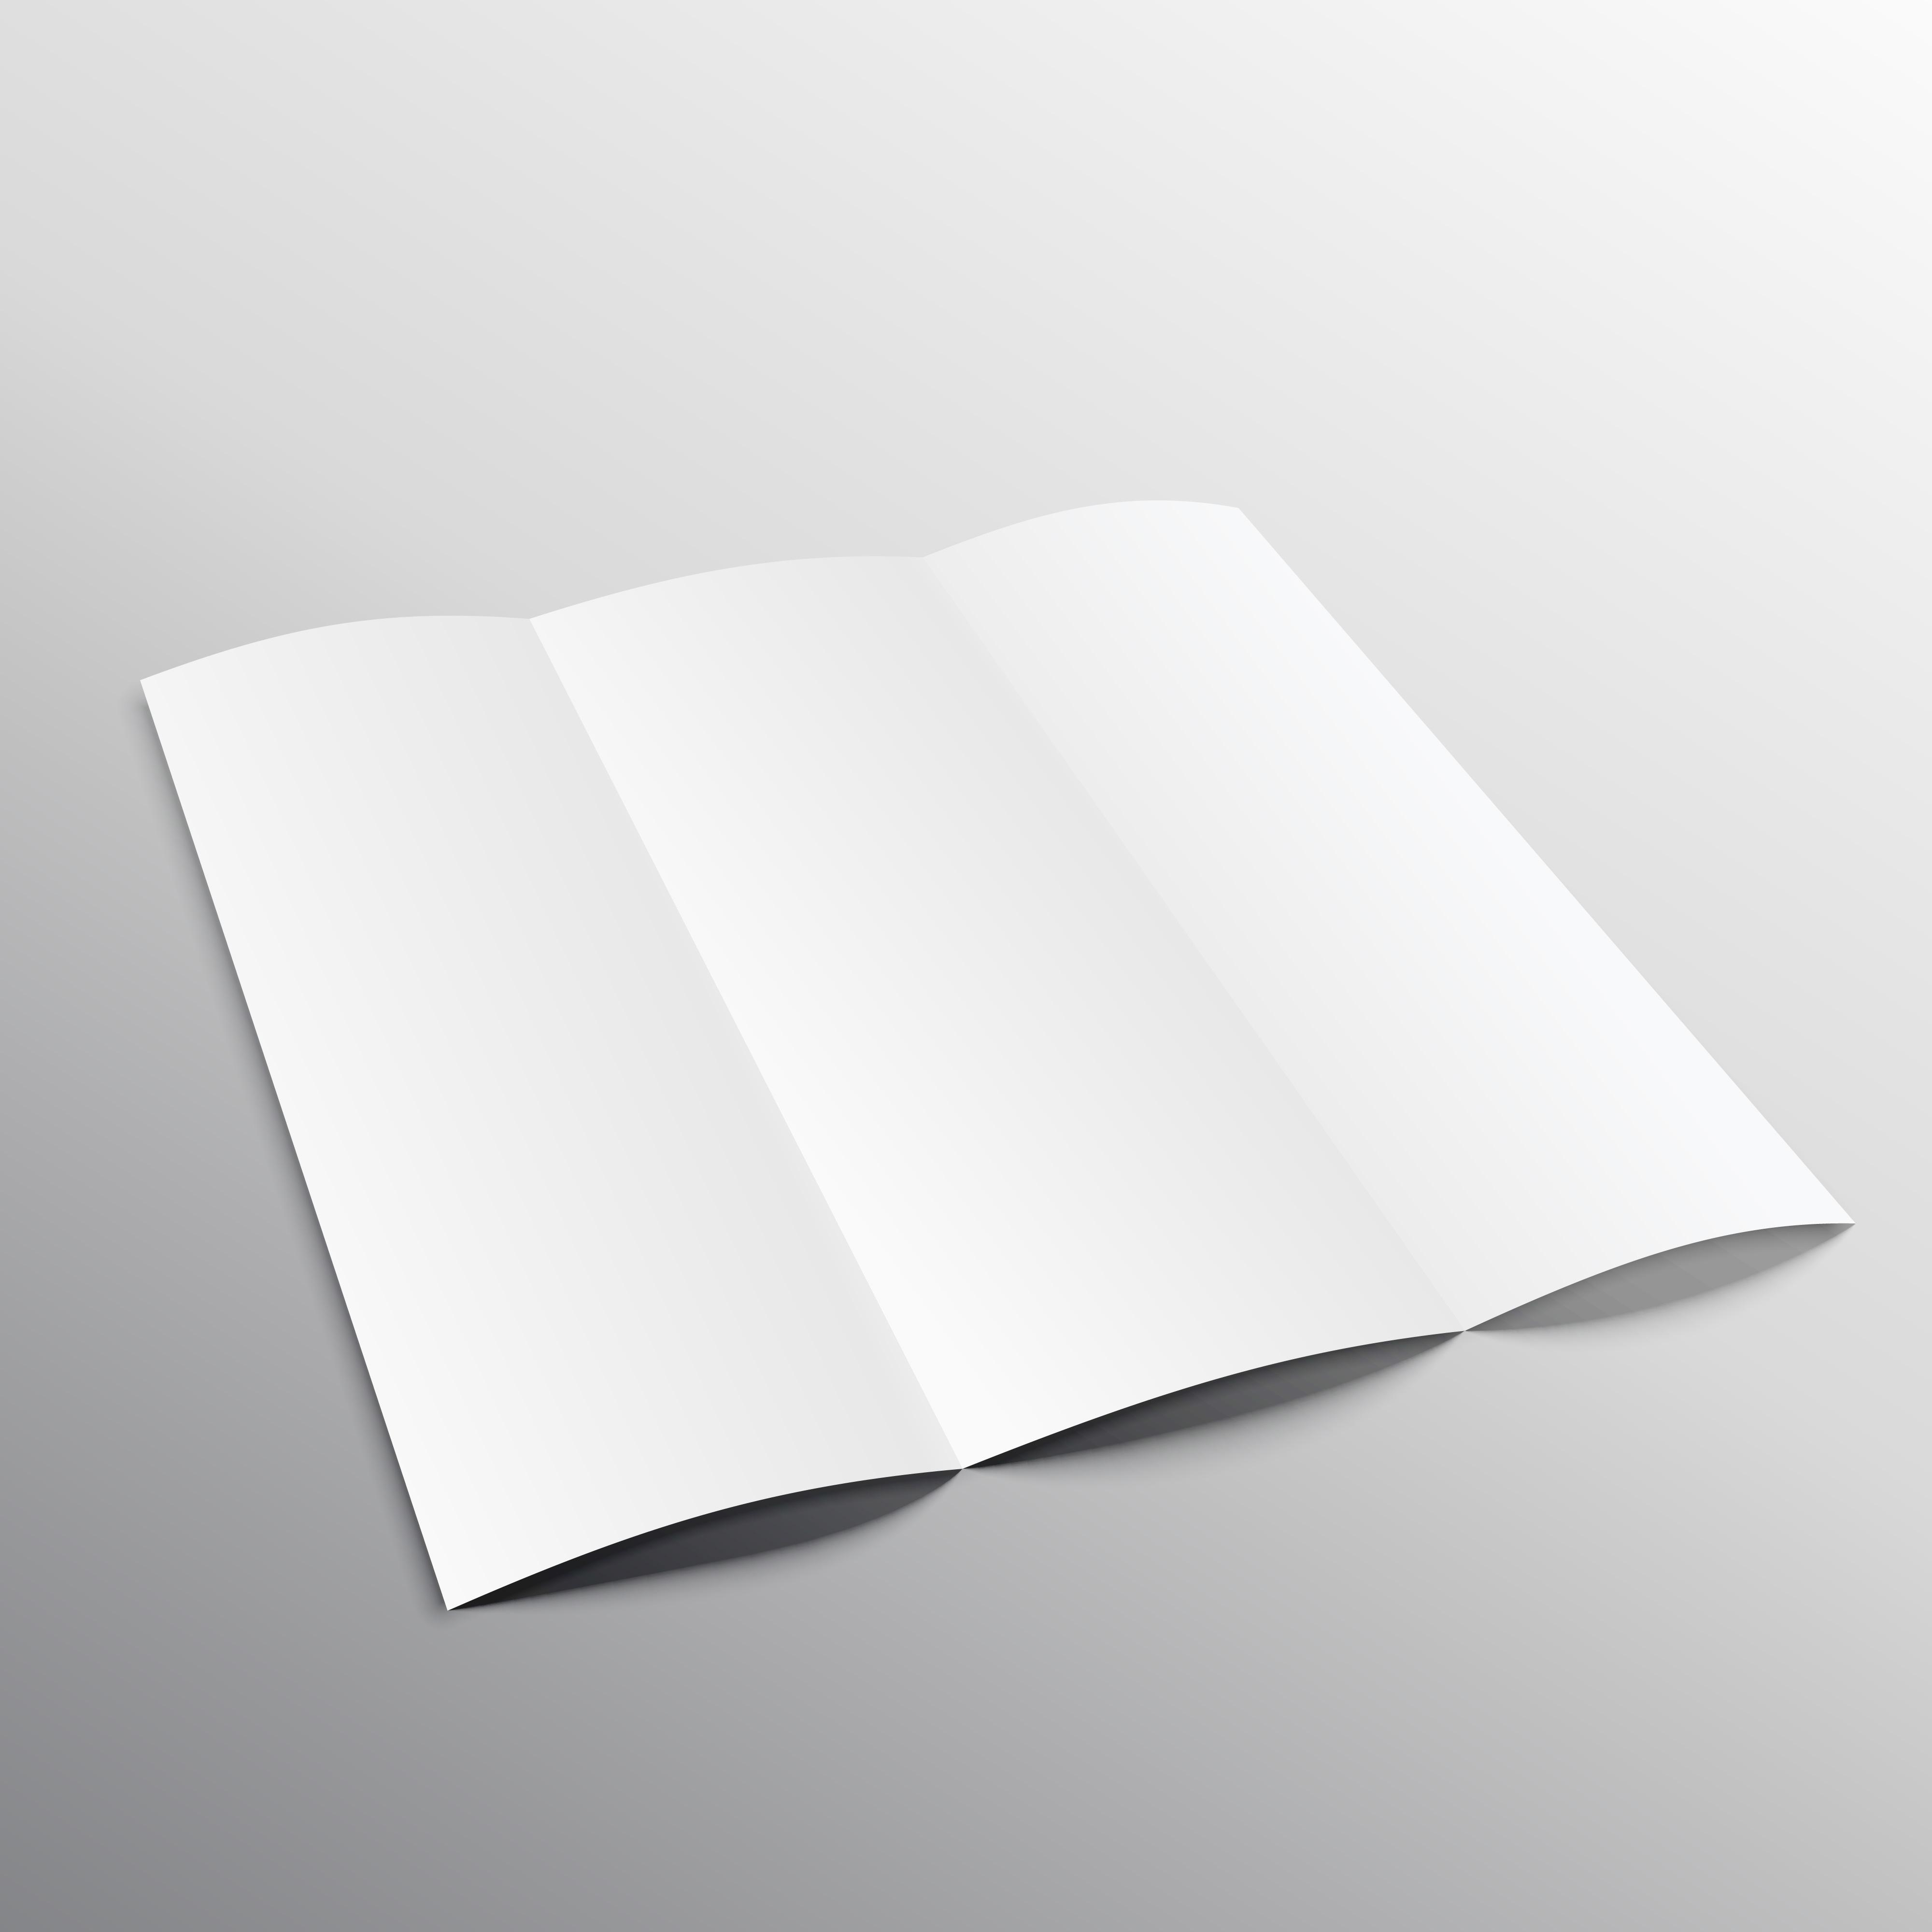 blank brochure free vector art 8923 free downloads